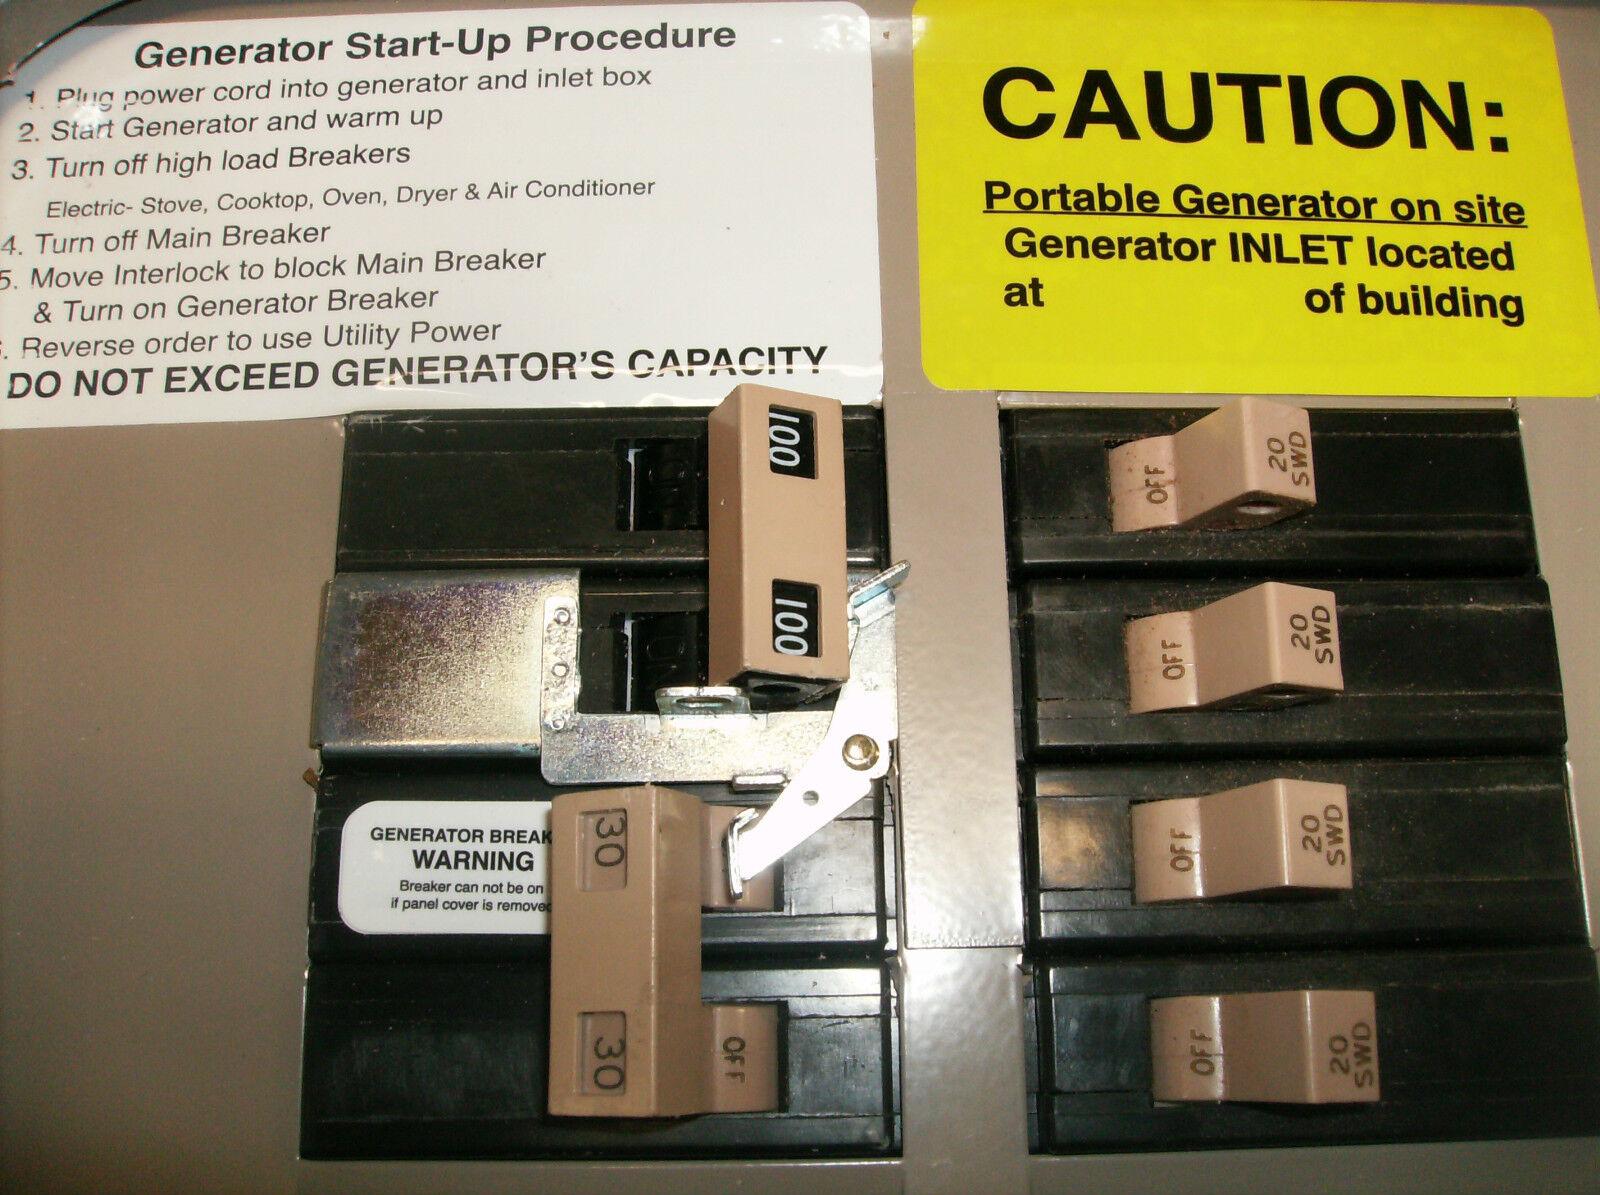 Eaton Generator Breaker Free Download 20 Amp 2pole Chtype Gfci Circuit Breakerch220gfcs The Home Depot Fac Ch100 Cutler Hammer Or Interlock Kit 100 Ch 30